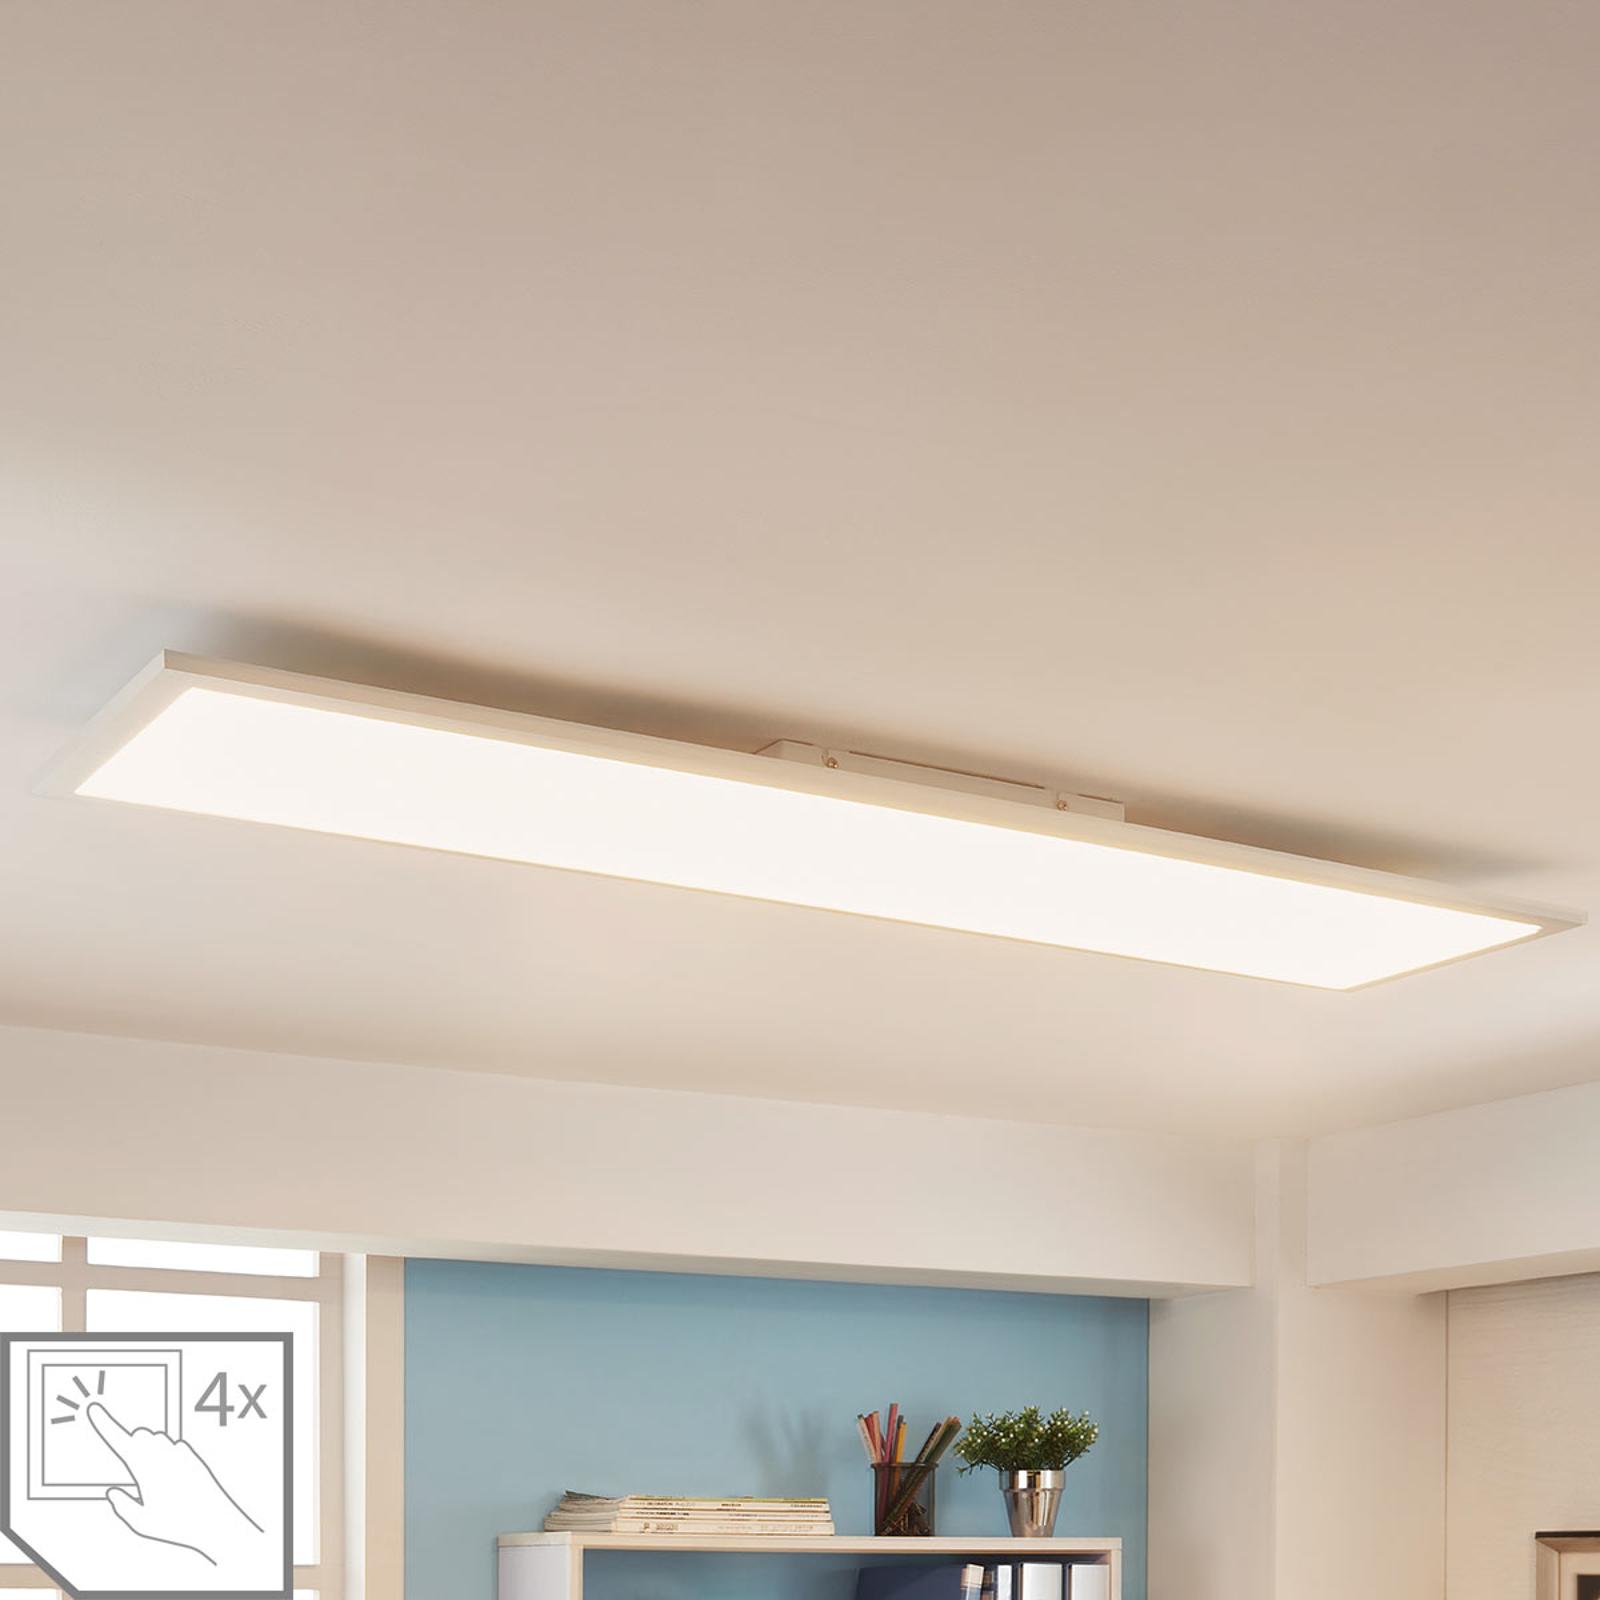 Panel LED Enja rectangular, 120 x 30 cm